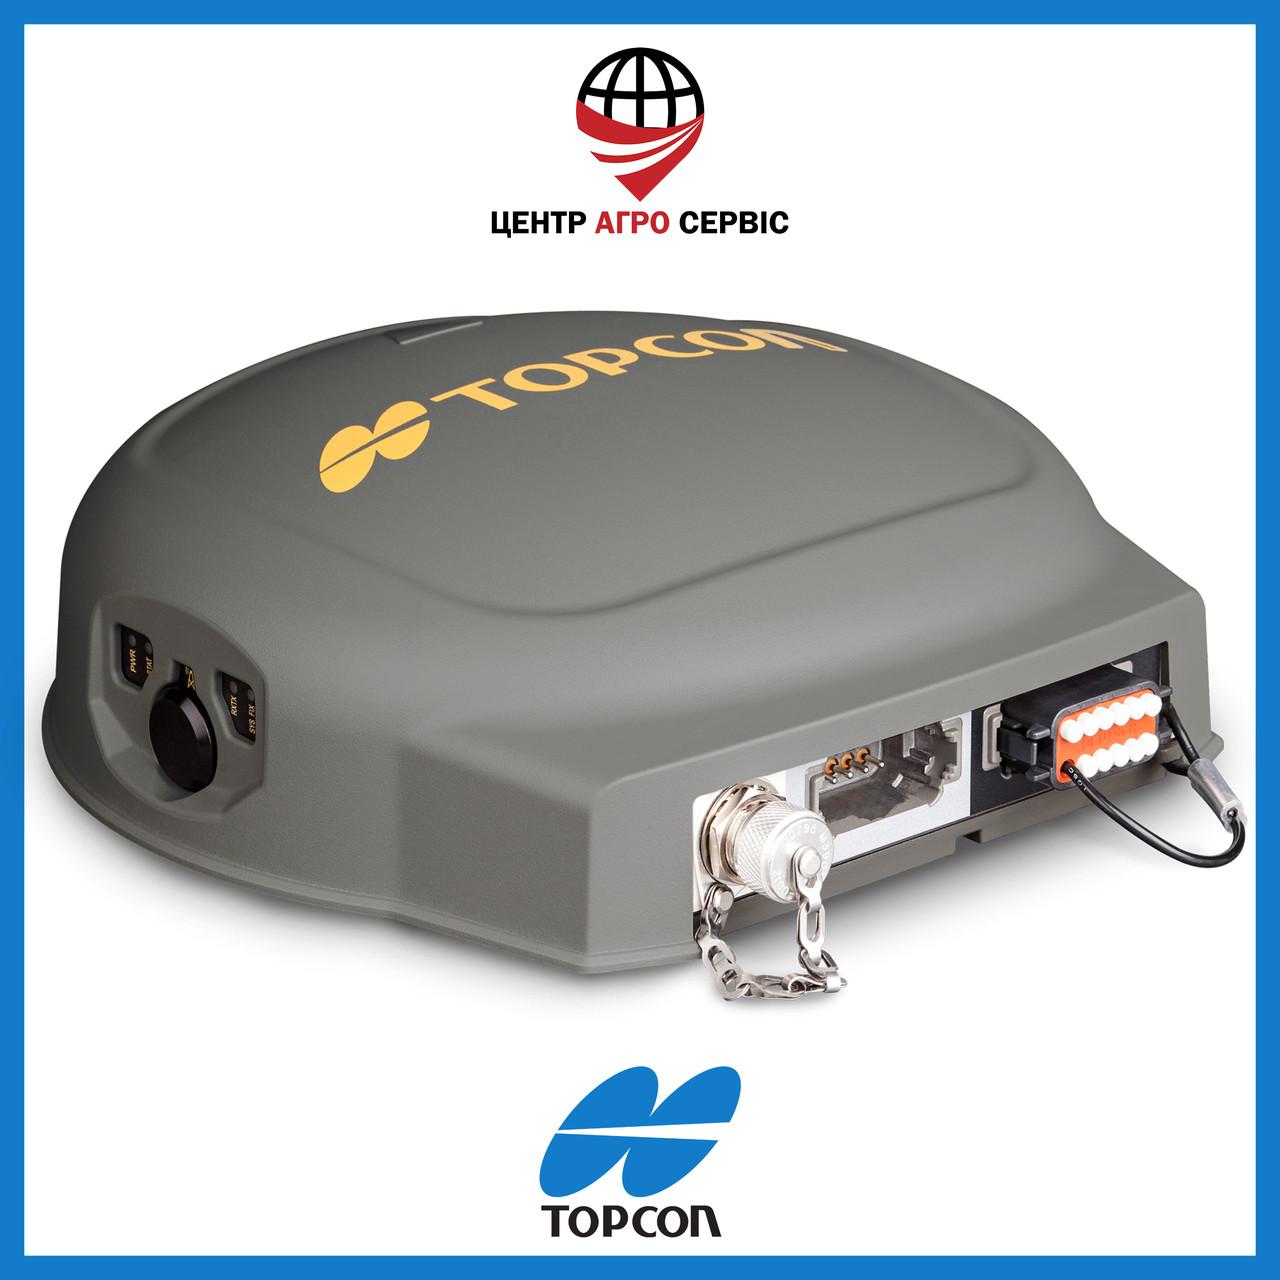 ПриемникAGI-4 Topcon, GPS и ГЛОНАСС (L1/L2 )